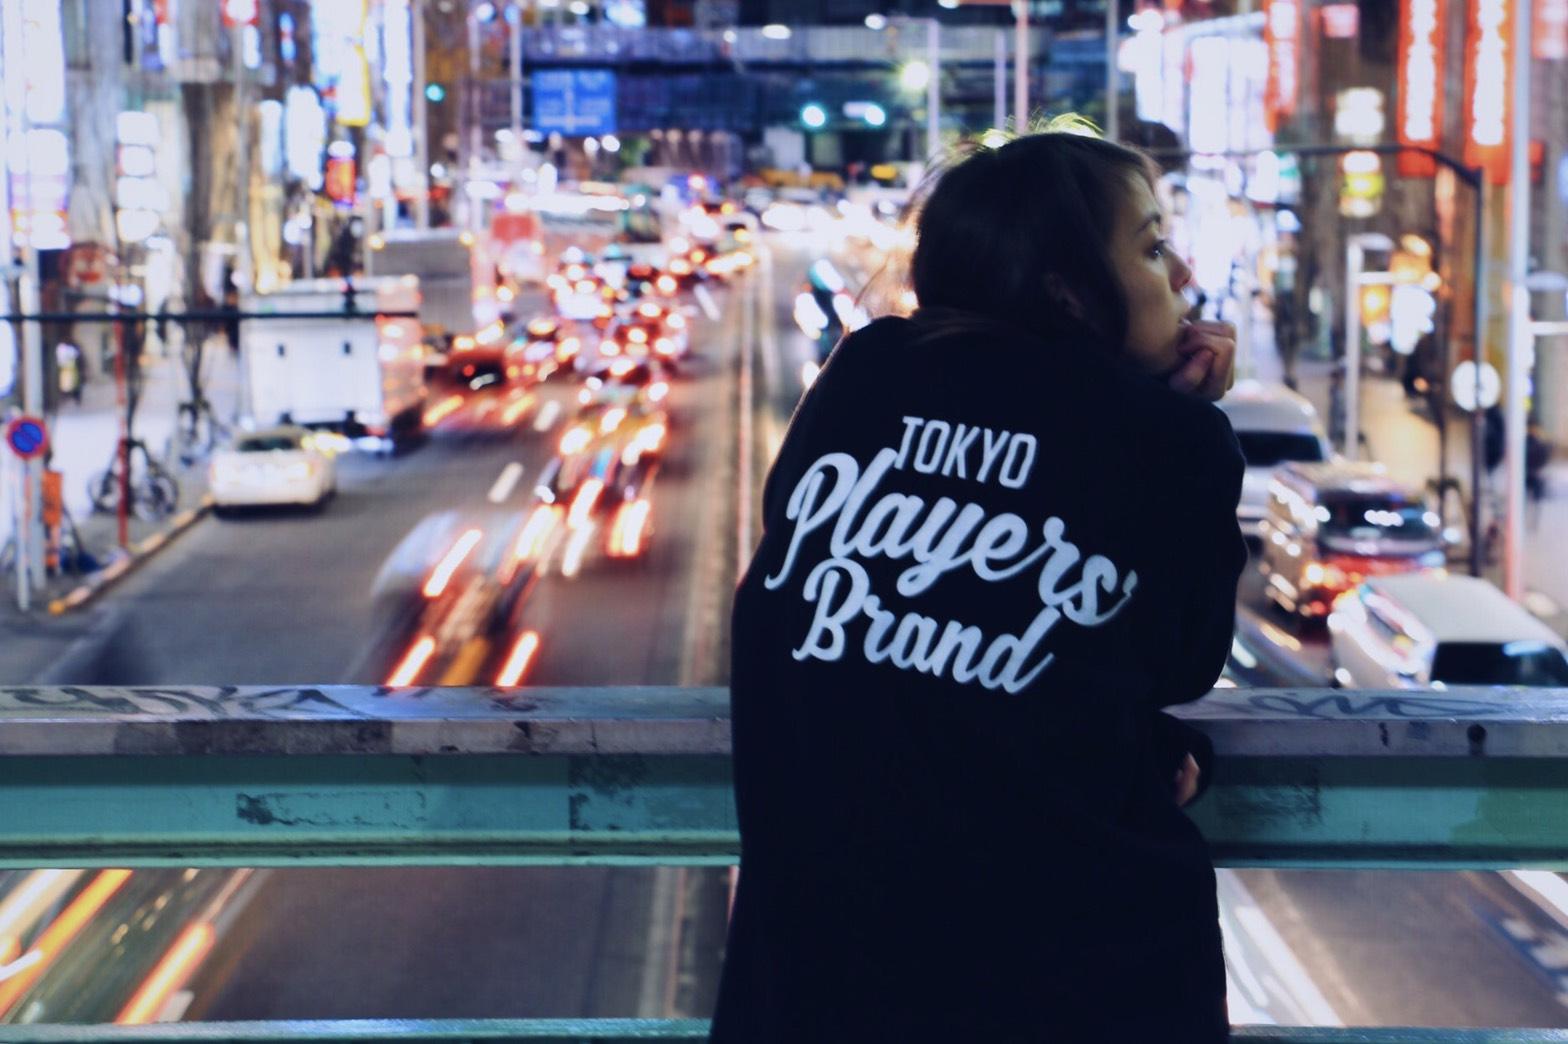 Sweater: Tokyo Player's Brand